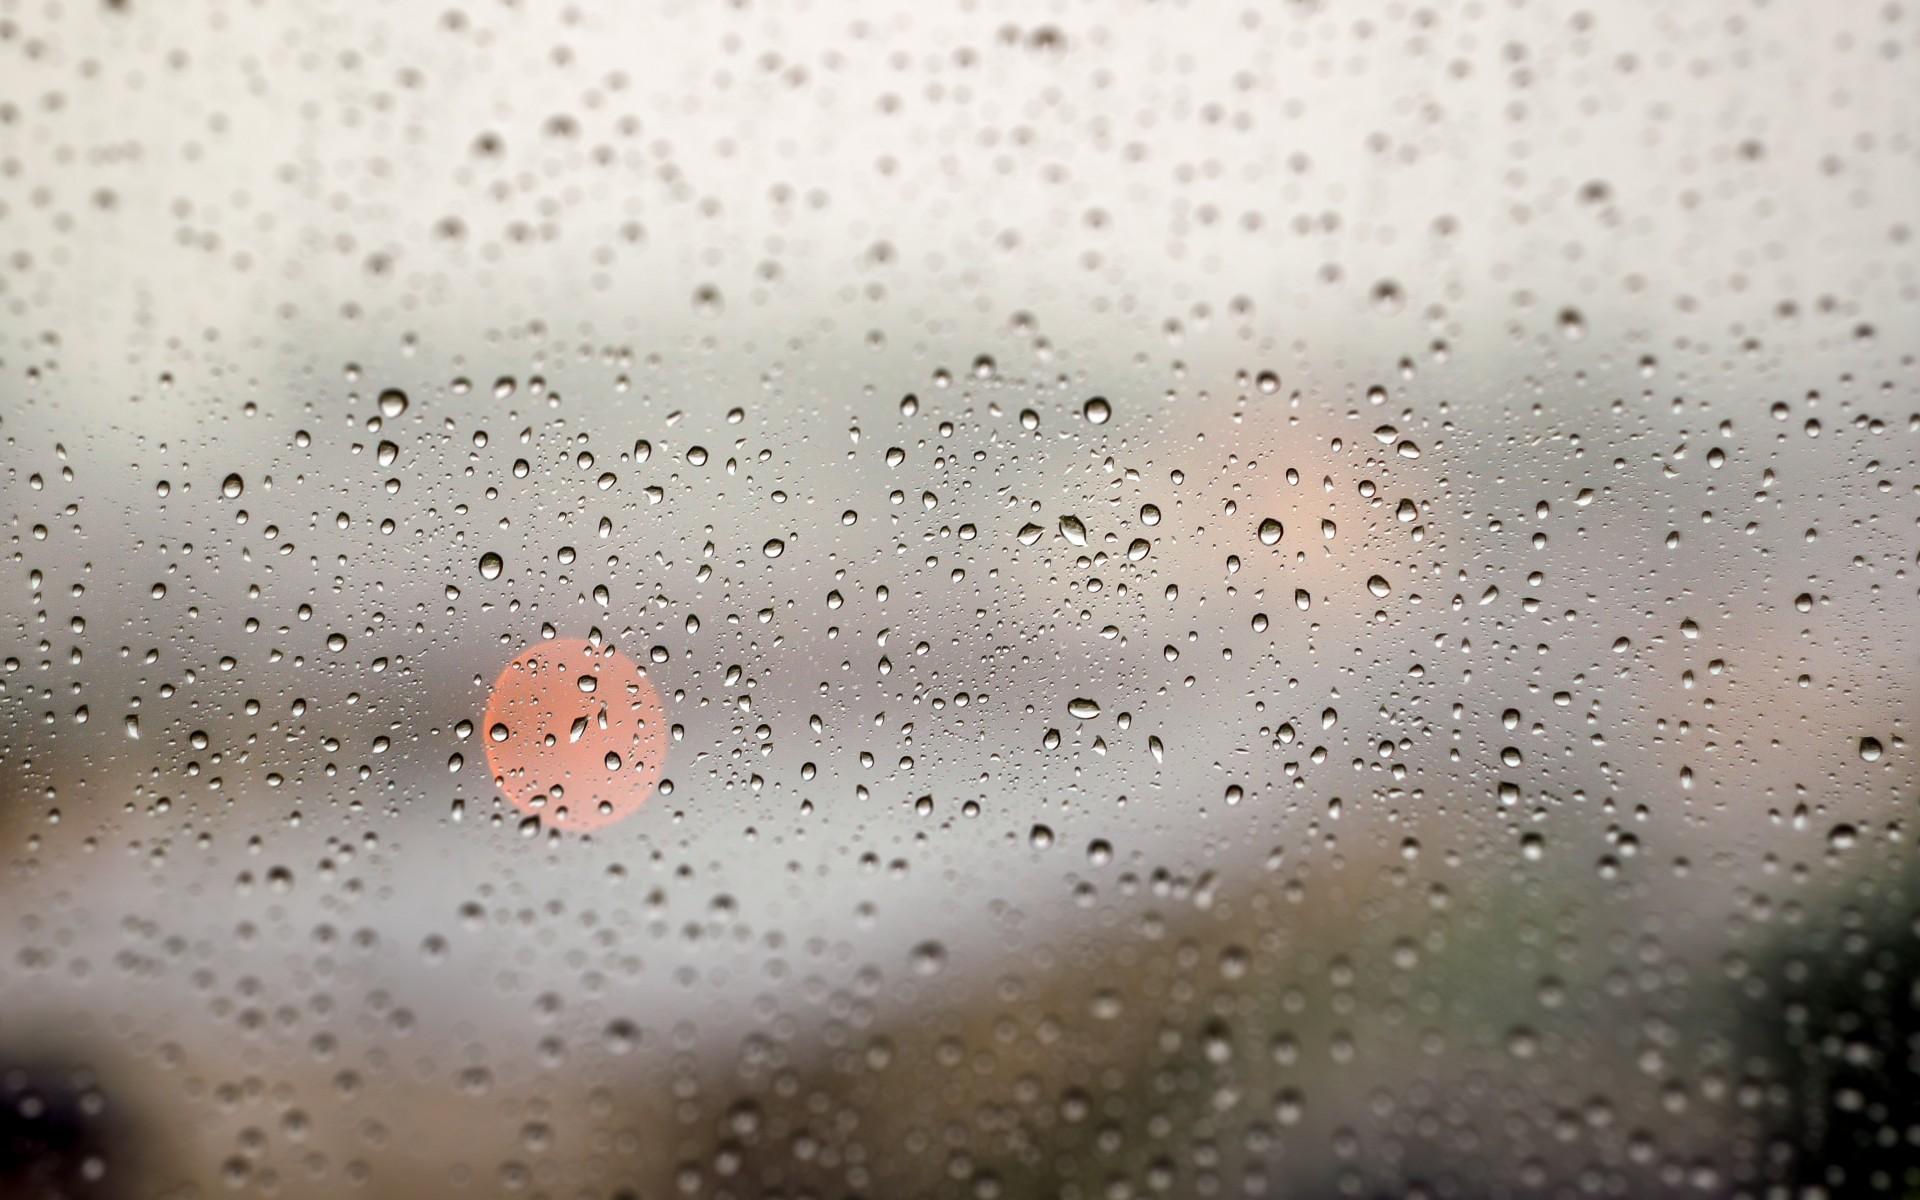 Glass window rain storm drops lights water wallpaper | .